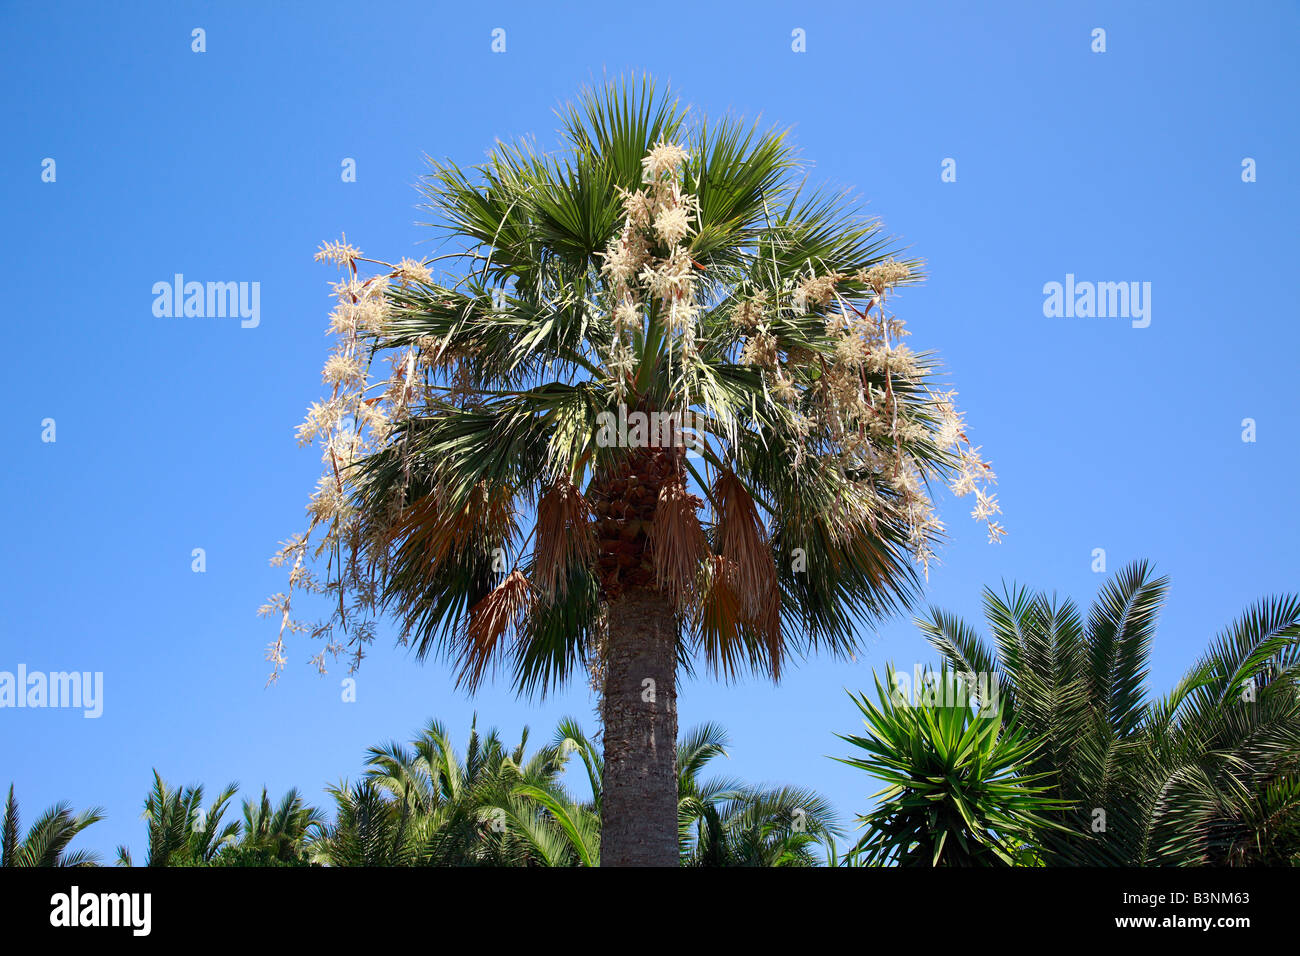 natur pflanzen palme hanfpalme trachycarpus kalabrien. Black Bedroom Furniture Sets. Home Design Ideas